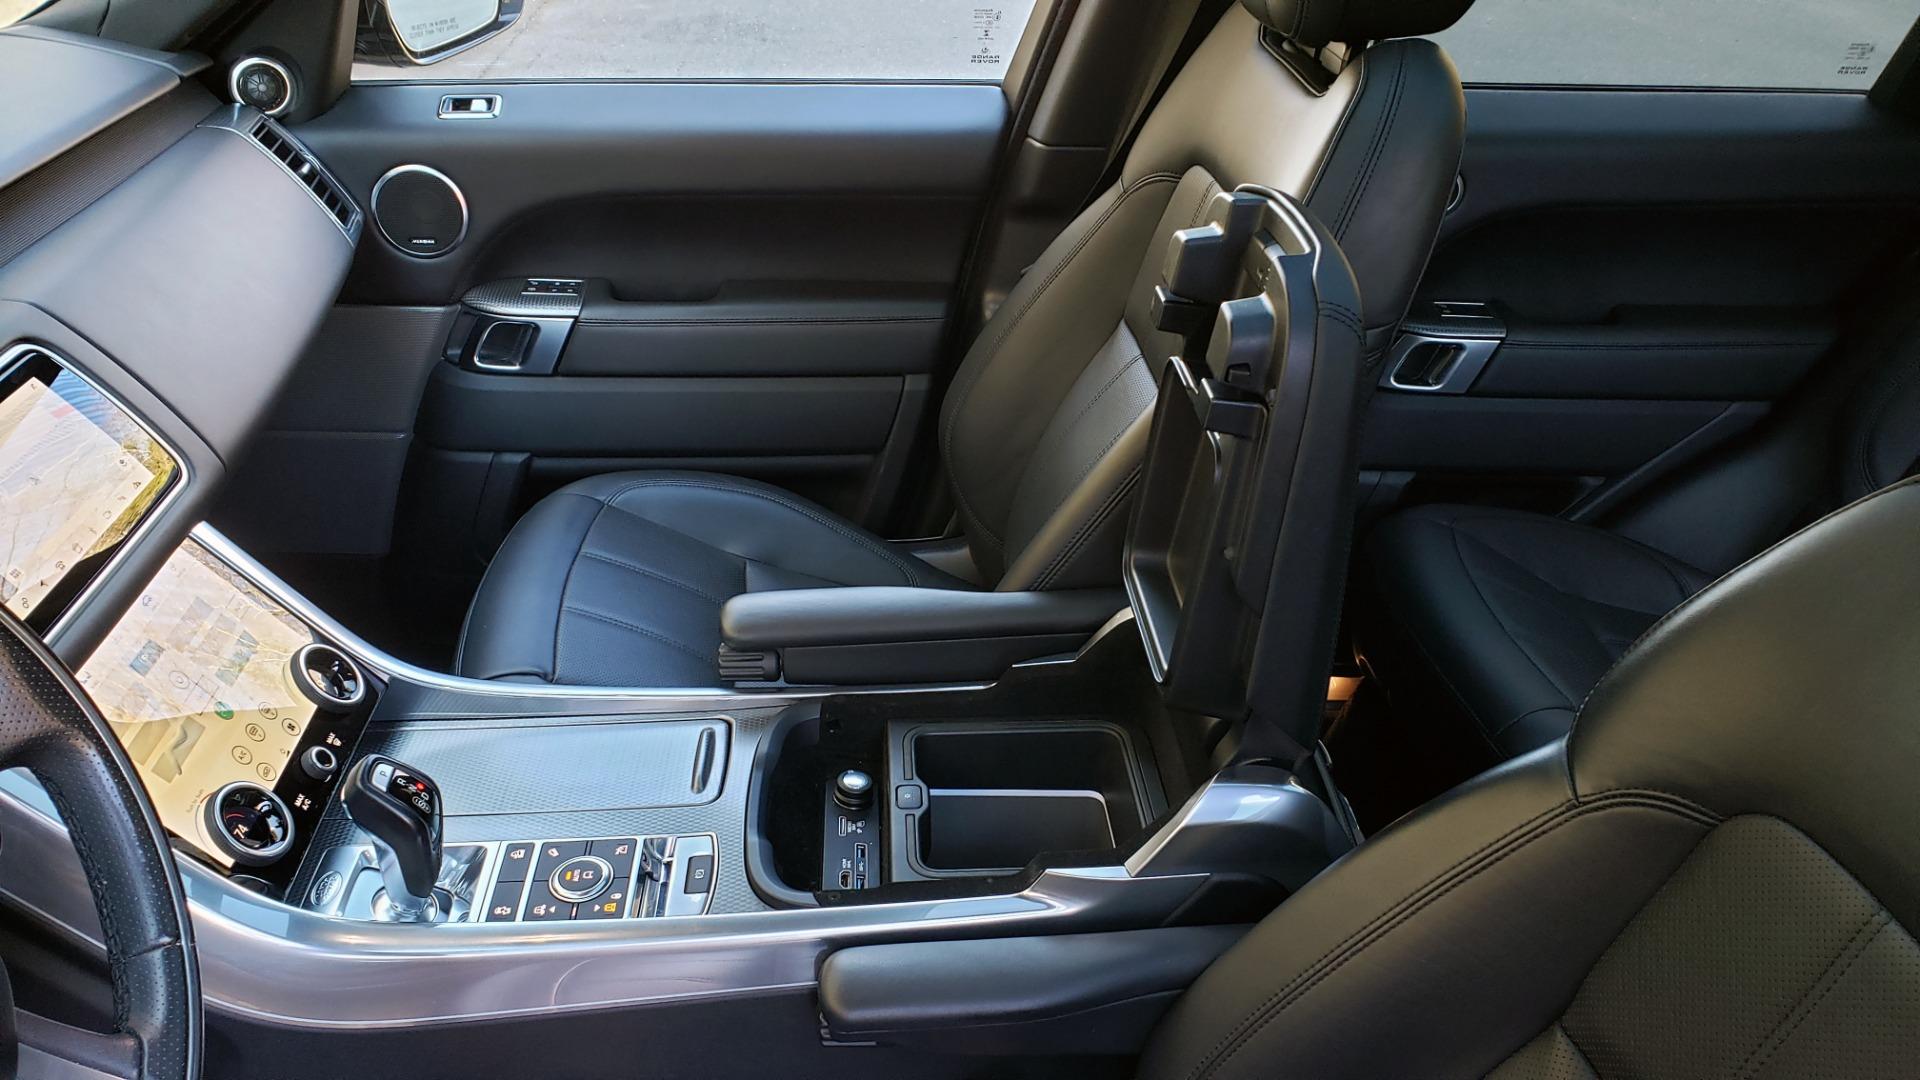 Used 2018 Land Rover RANGE ROVER SPORT DYNAMIC SC V8 / CLIMATE CMFRT / VISION ASST / MERIDIAN for sale Sold at Formula Imports in Charlotte NC 28227 66